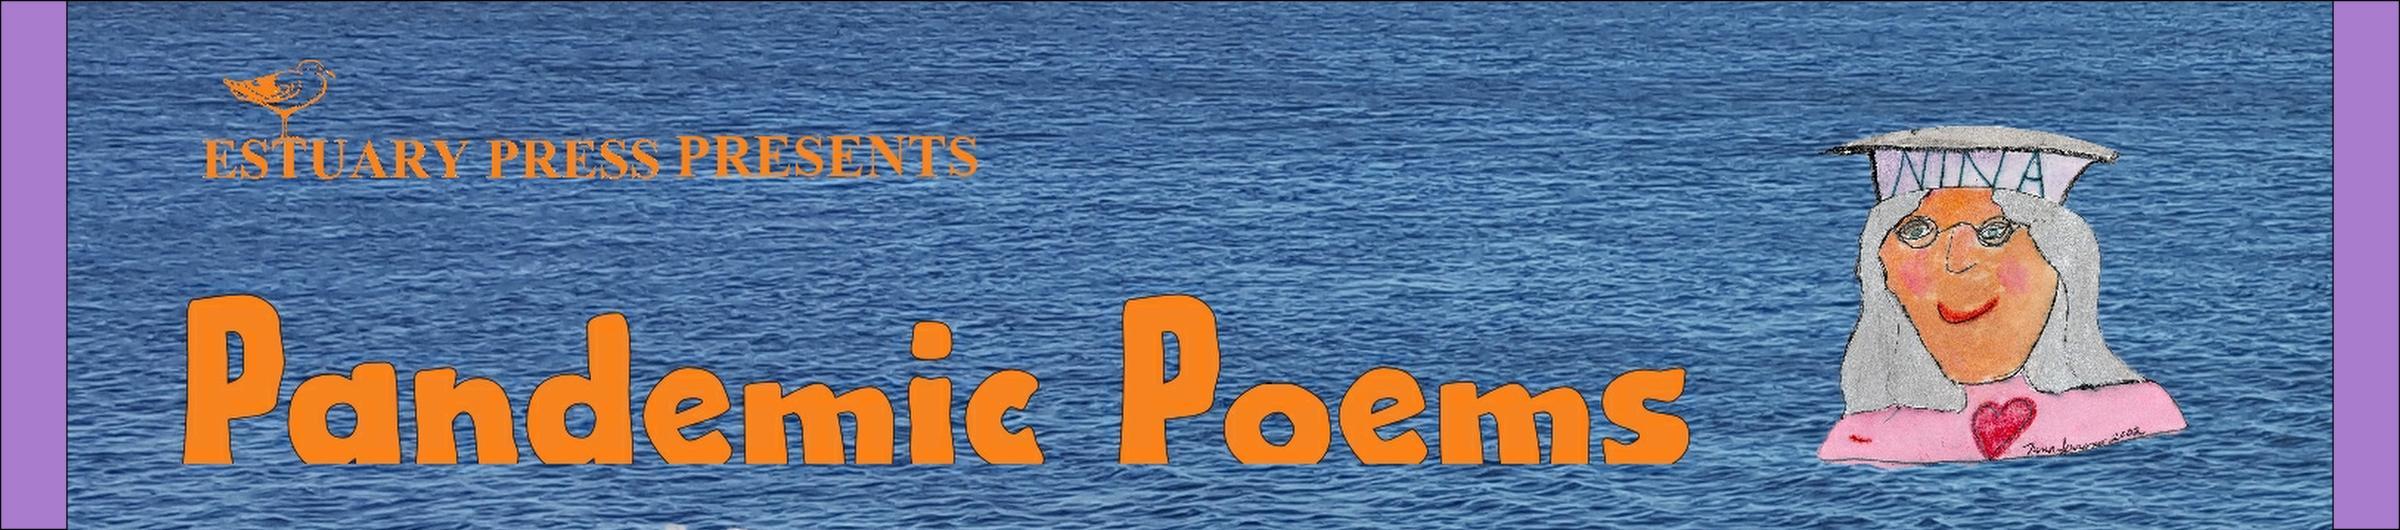 pandemic poems header image